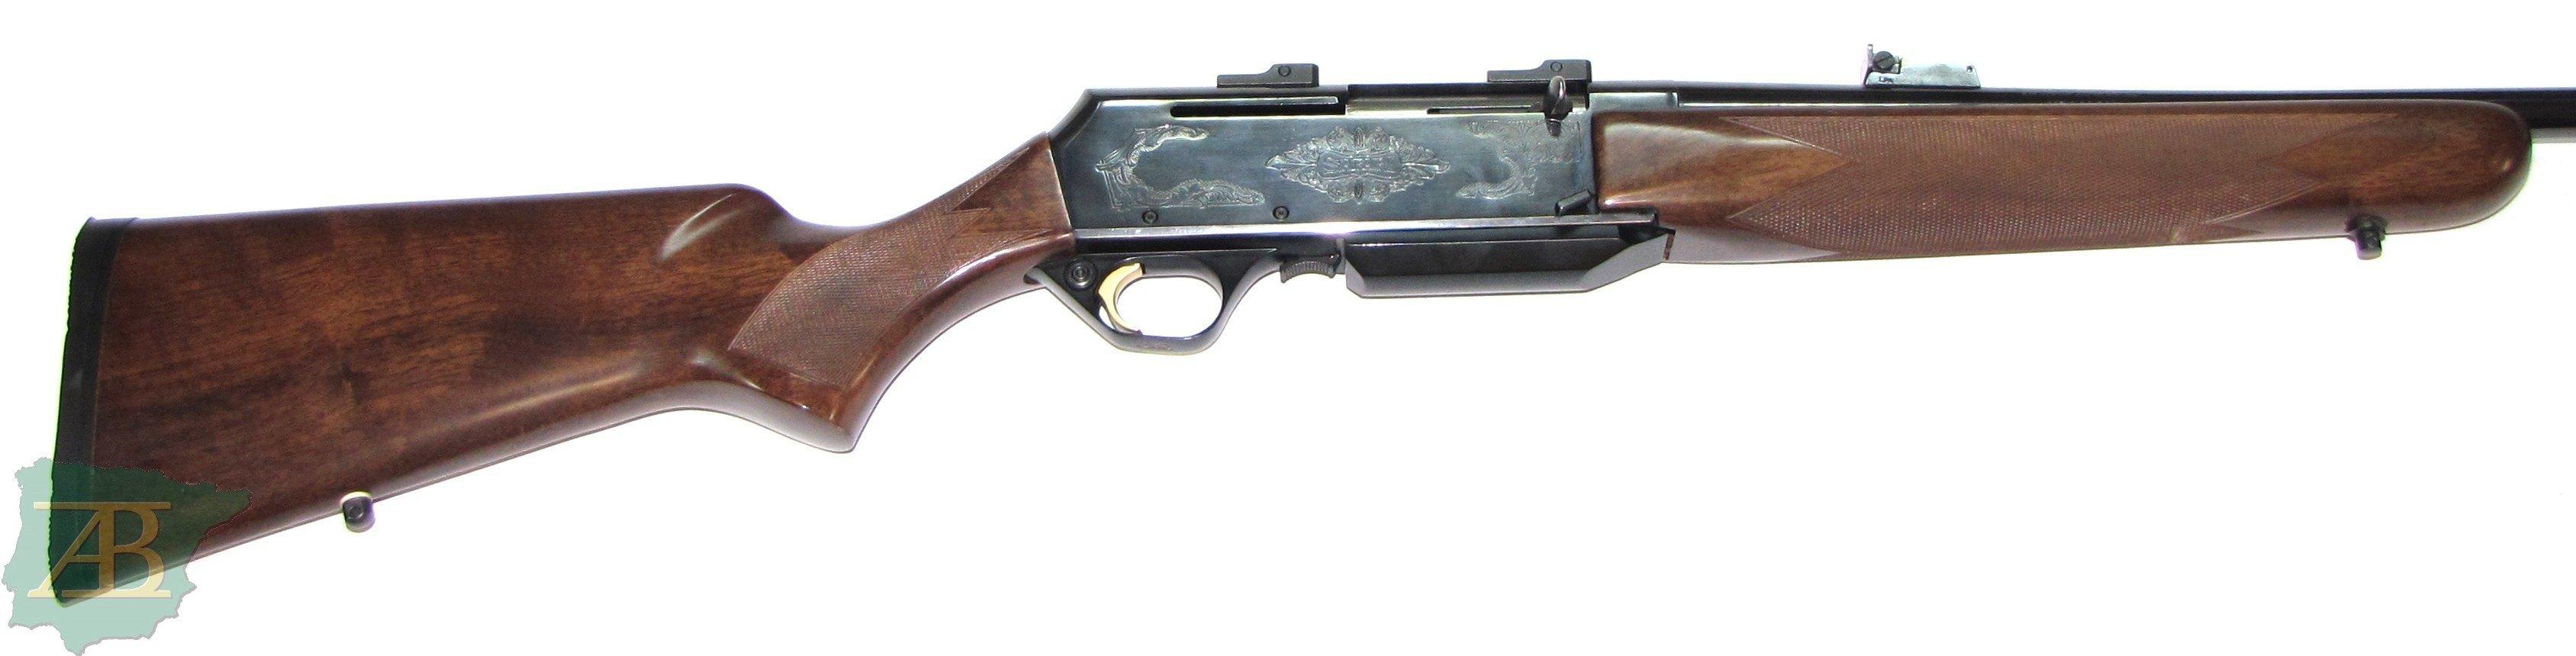 Rifle de cerrojo de caza BROWNING BAR II ref REP2019-725-armeriaiberica-2